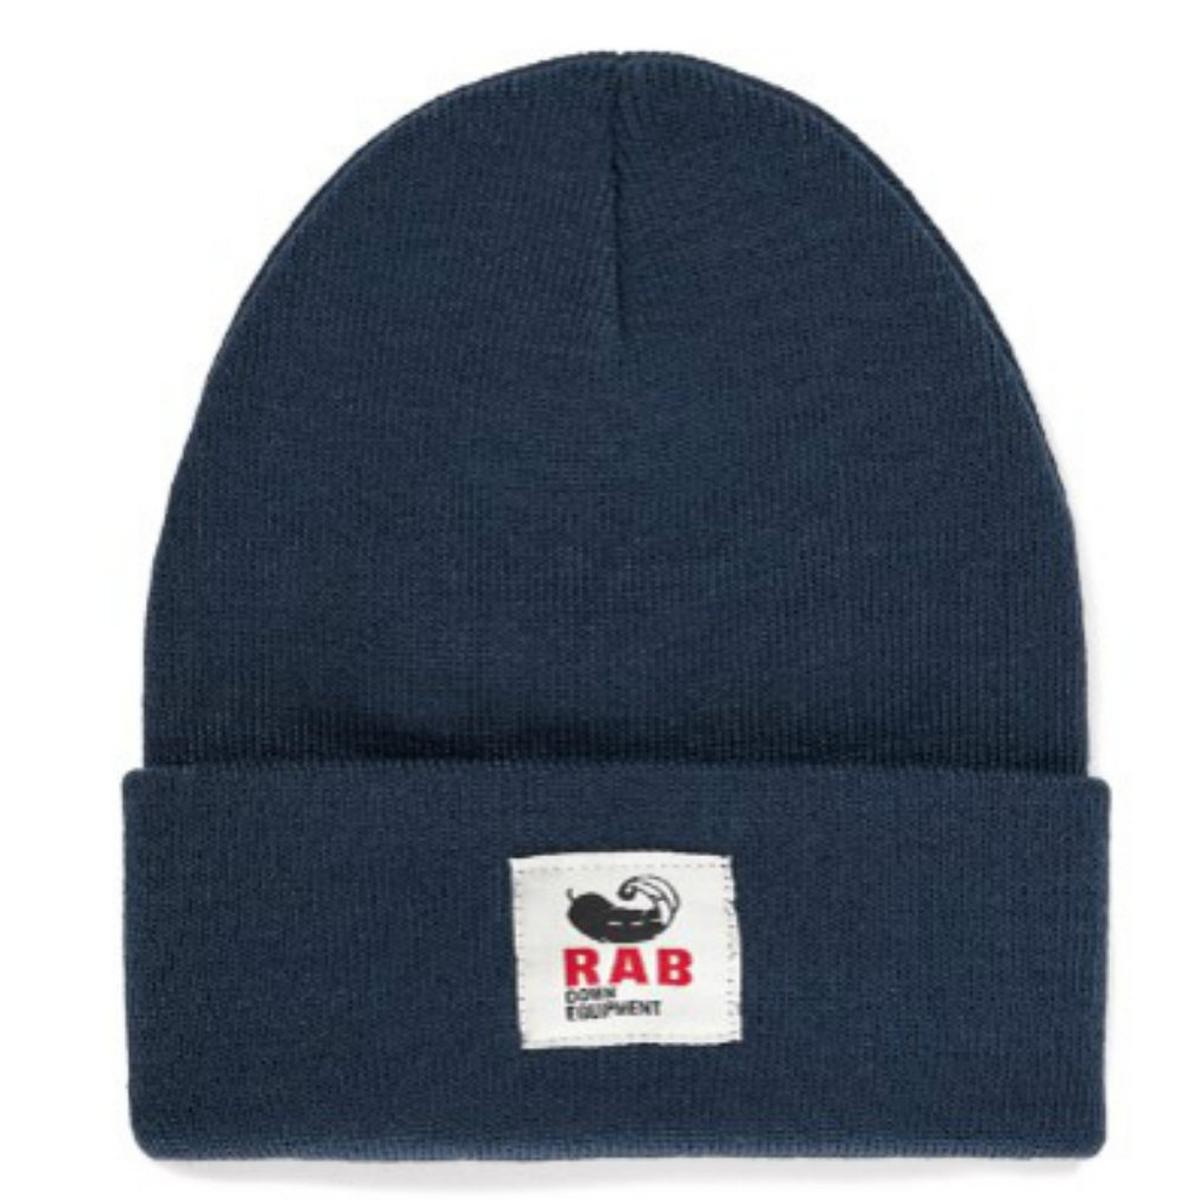 Rab Unisex Essential Beanie